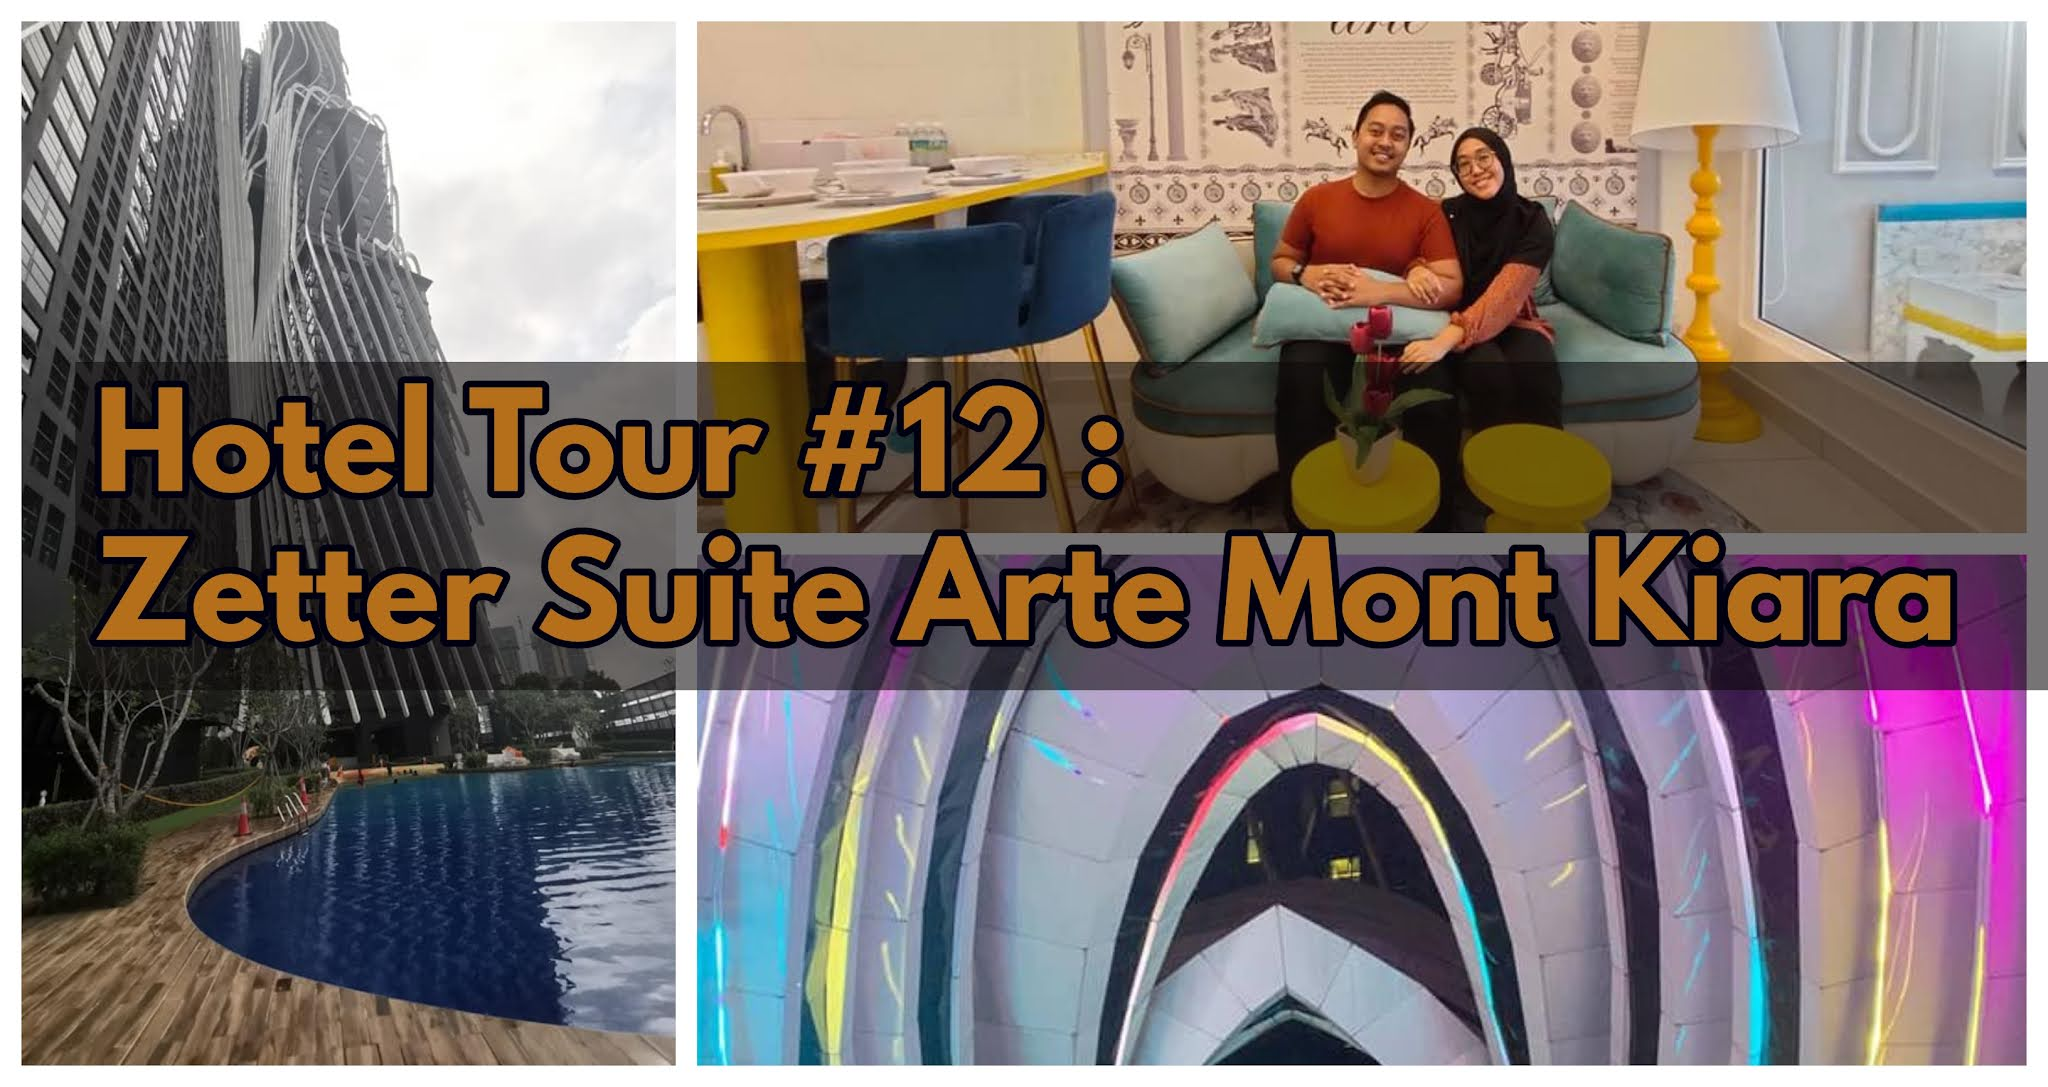 Hotel Tour #12 :  Zetter Suite Arte Mont Kiara   Apartment Suite Mewah Dengan Interior Unik!